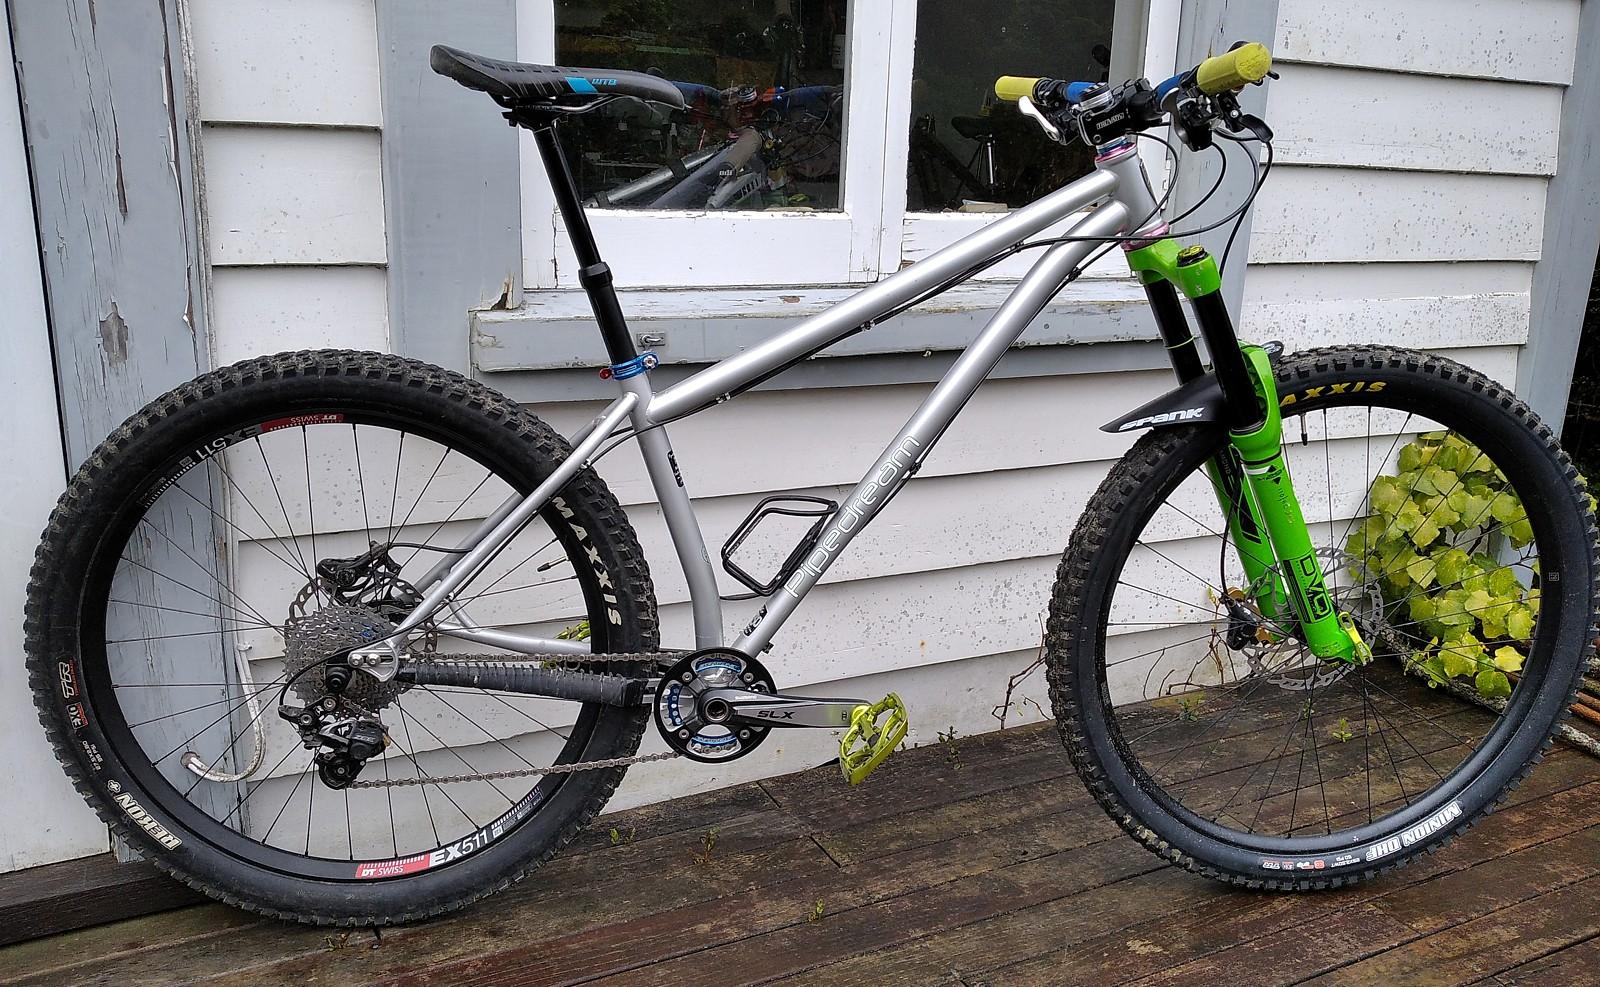 Pipedream Moxie v1 mullet  - Velocipedestrian - Mountain Biking Pictures - Vital MTB